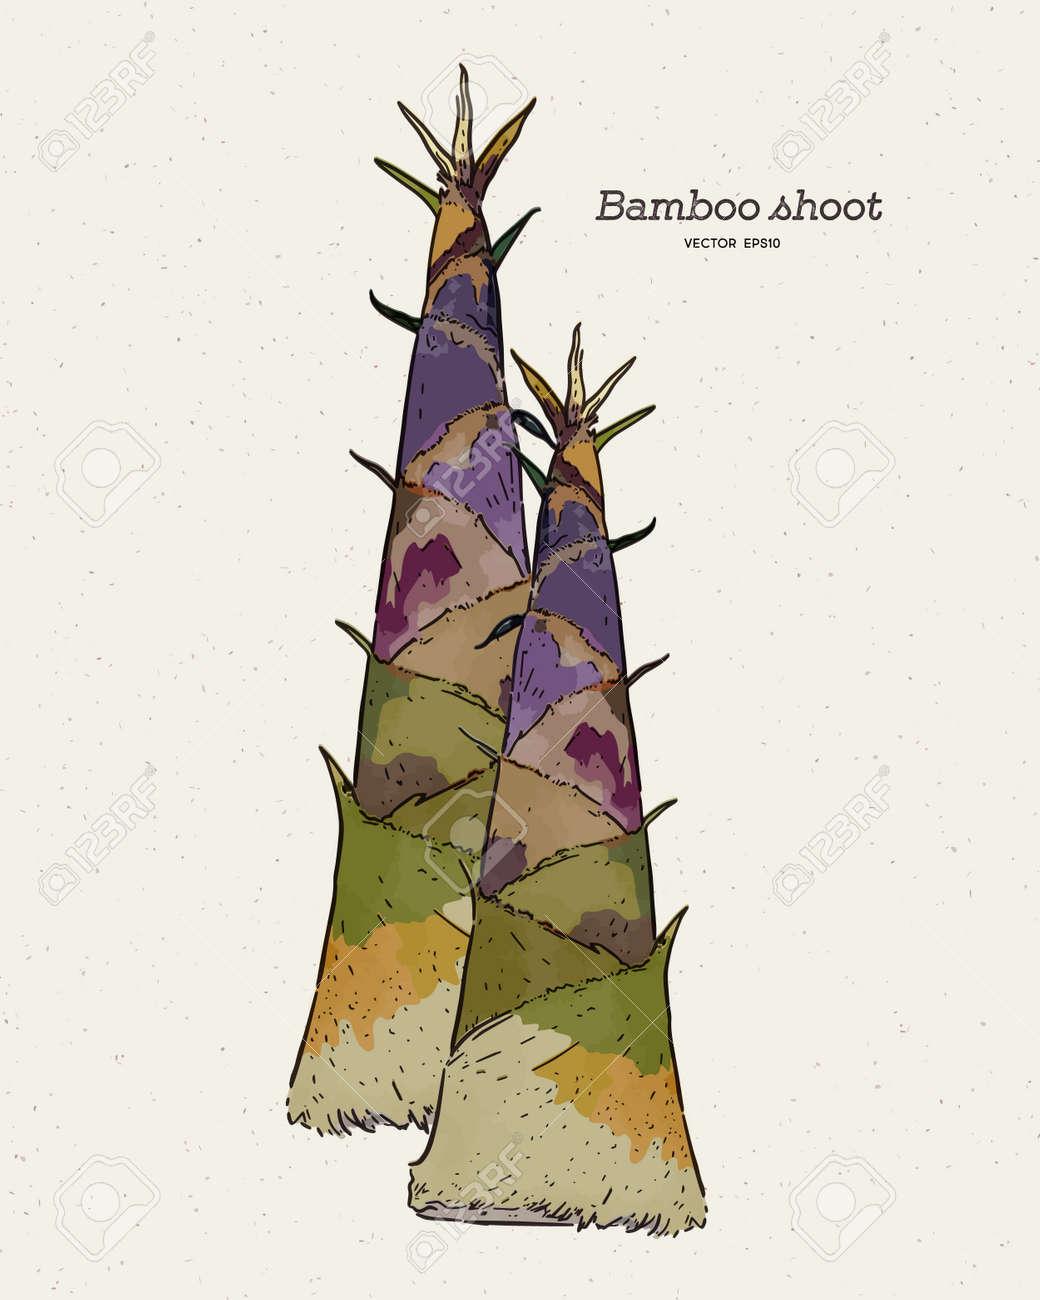 bamboo shoot, hand draw sketch vector. - 165340404